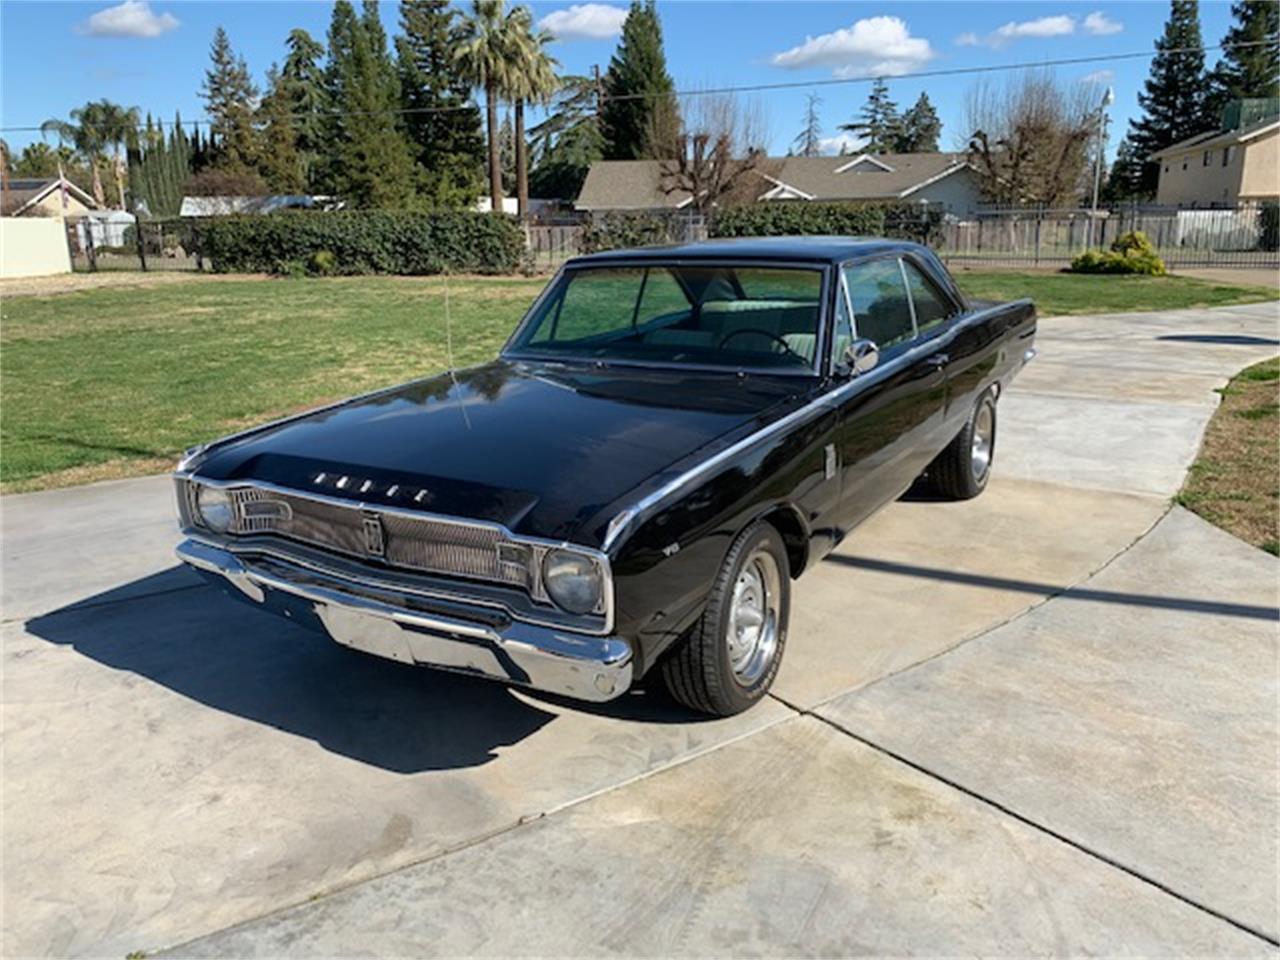 1967 Dodge Dart For Sale Classiccarscom Cc 1187931